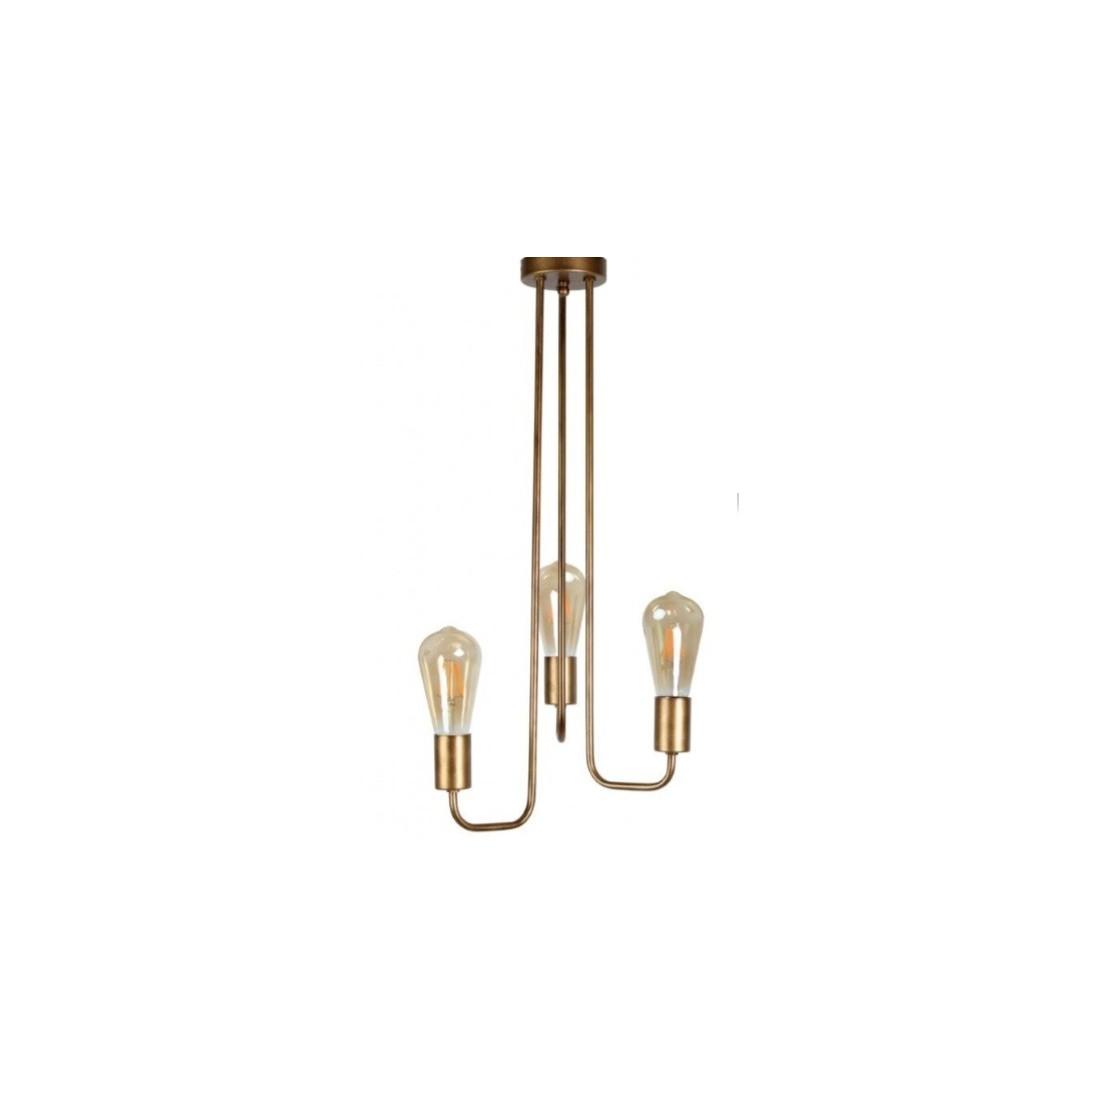 Lamparas baratas lamparas modernas baratas lamparas de - Lamparas colgantes modernas ...